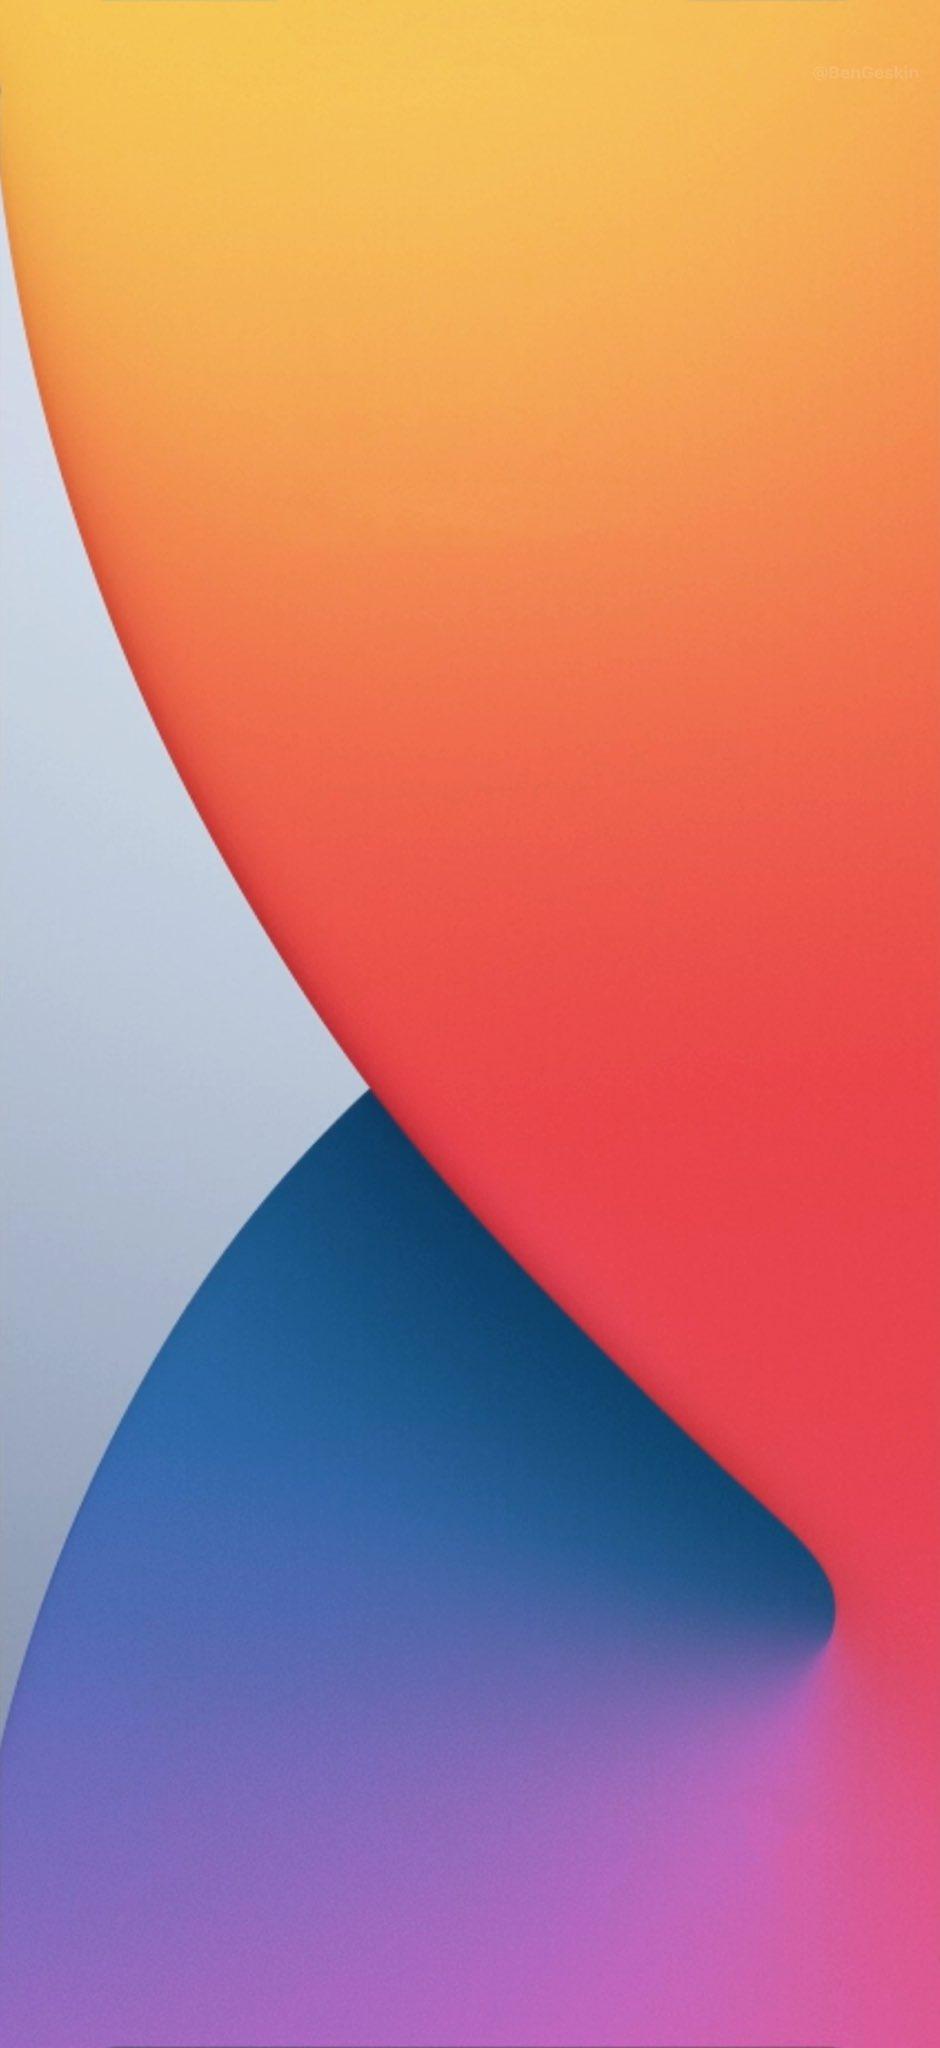 Here S The Ios 14 Wallpaper In Full Resolution Appleinformed